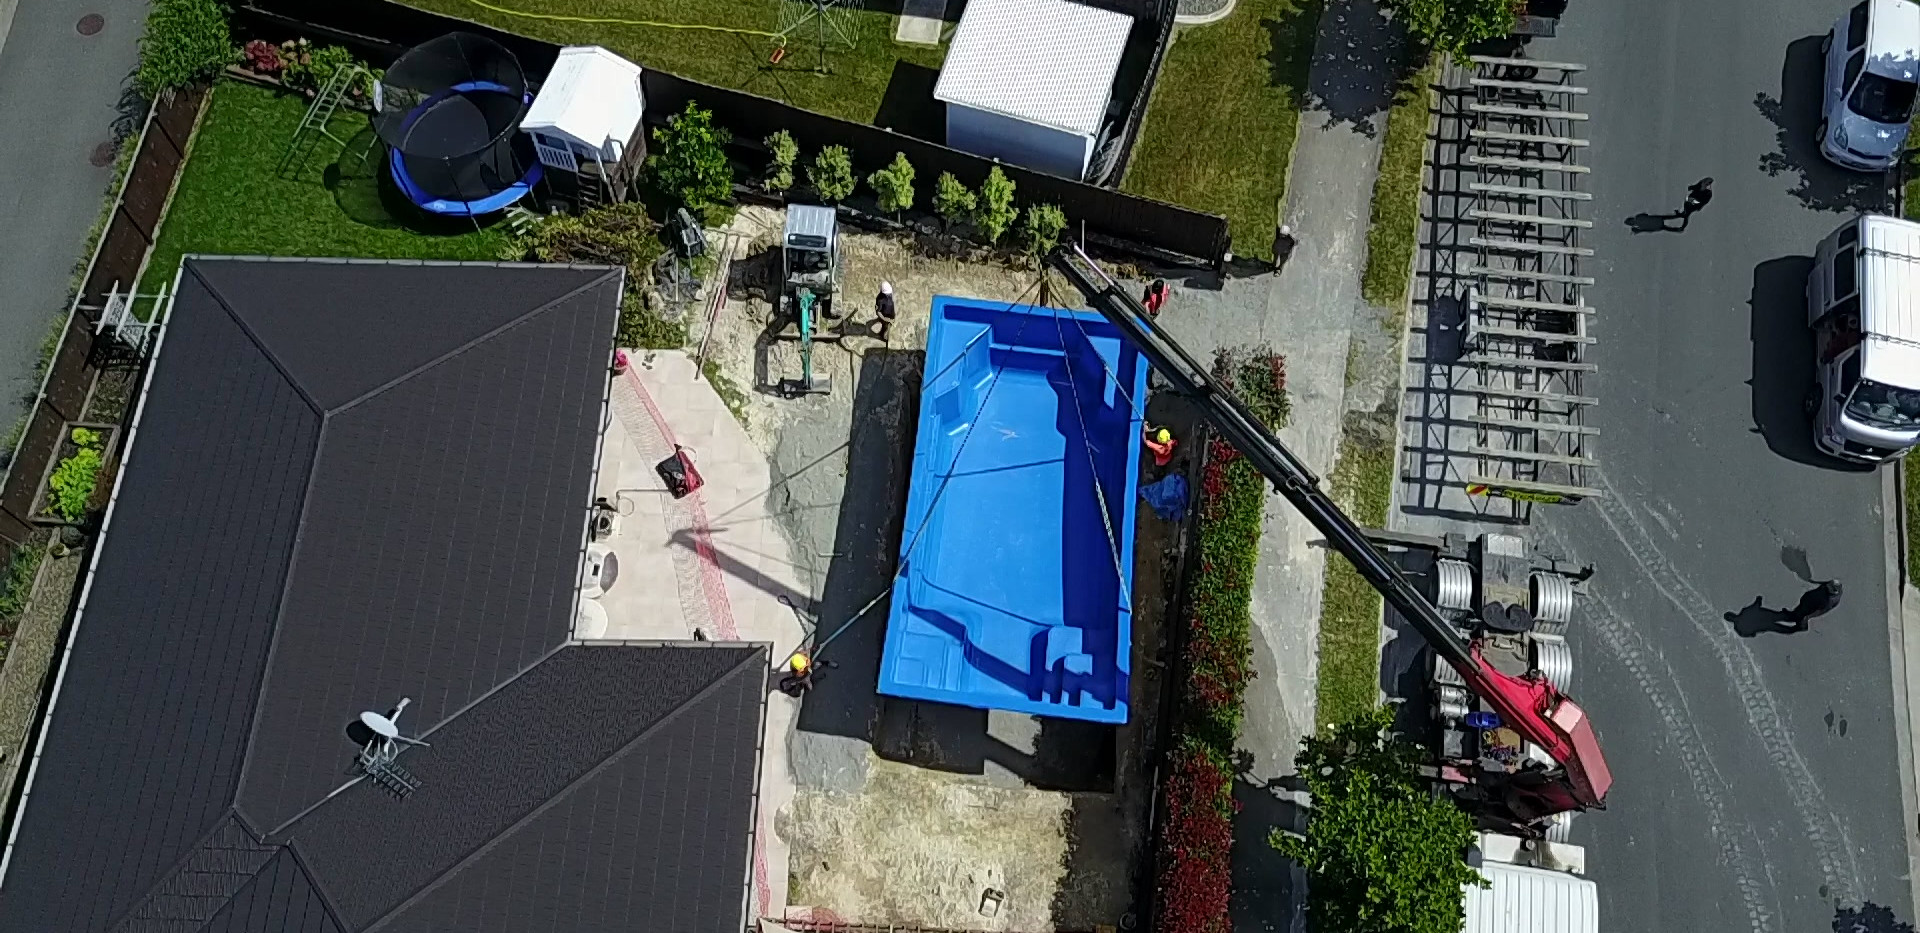 Medium family pool